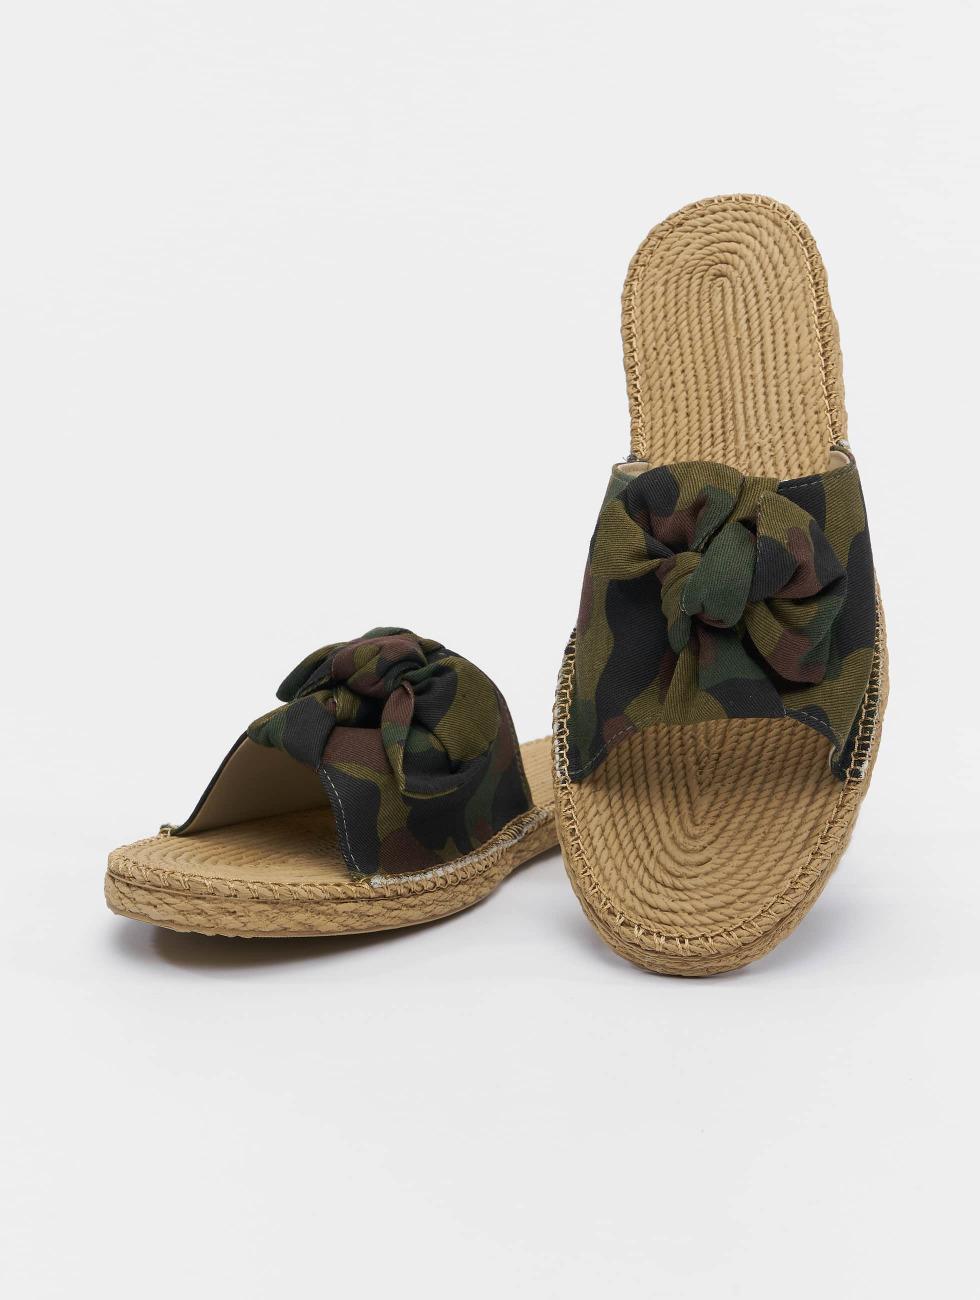 Urban Classics schoen / Slipper/Sandaal Canvas Mules in camouflage 477503 Discount Goedkope Online Korting Nieuwe Aankomst Outlet Echt F2fZRPcAj